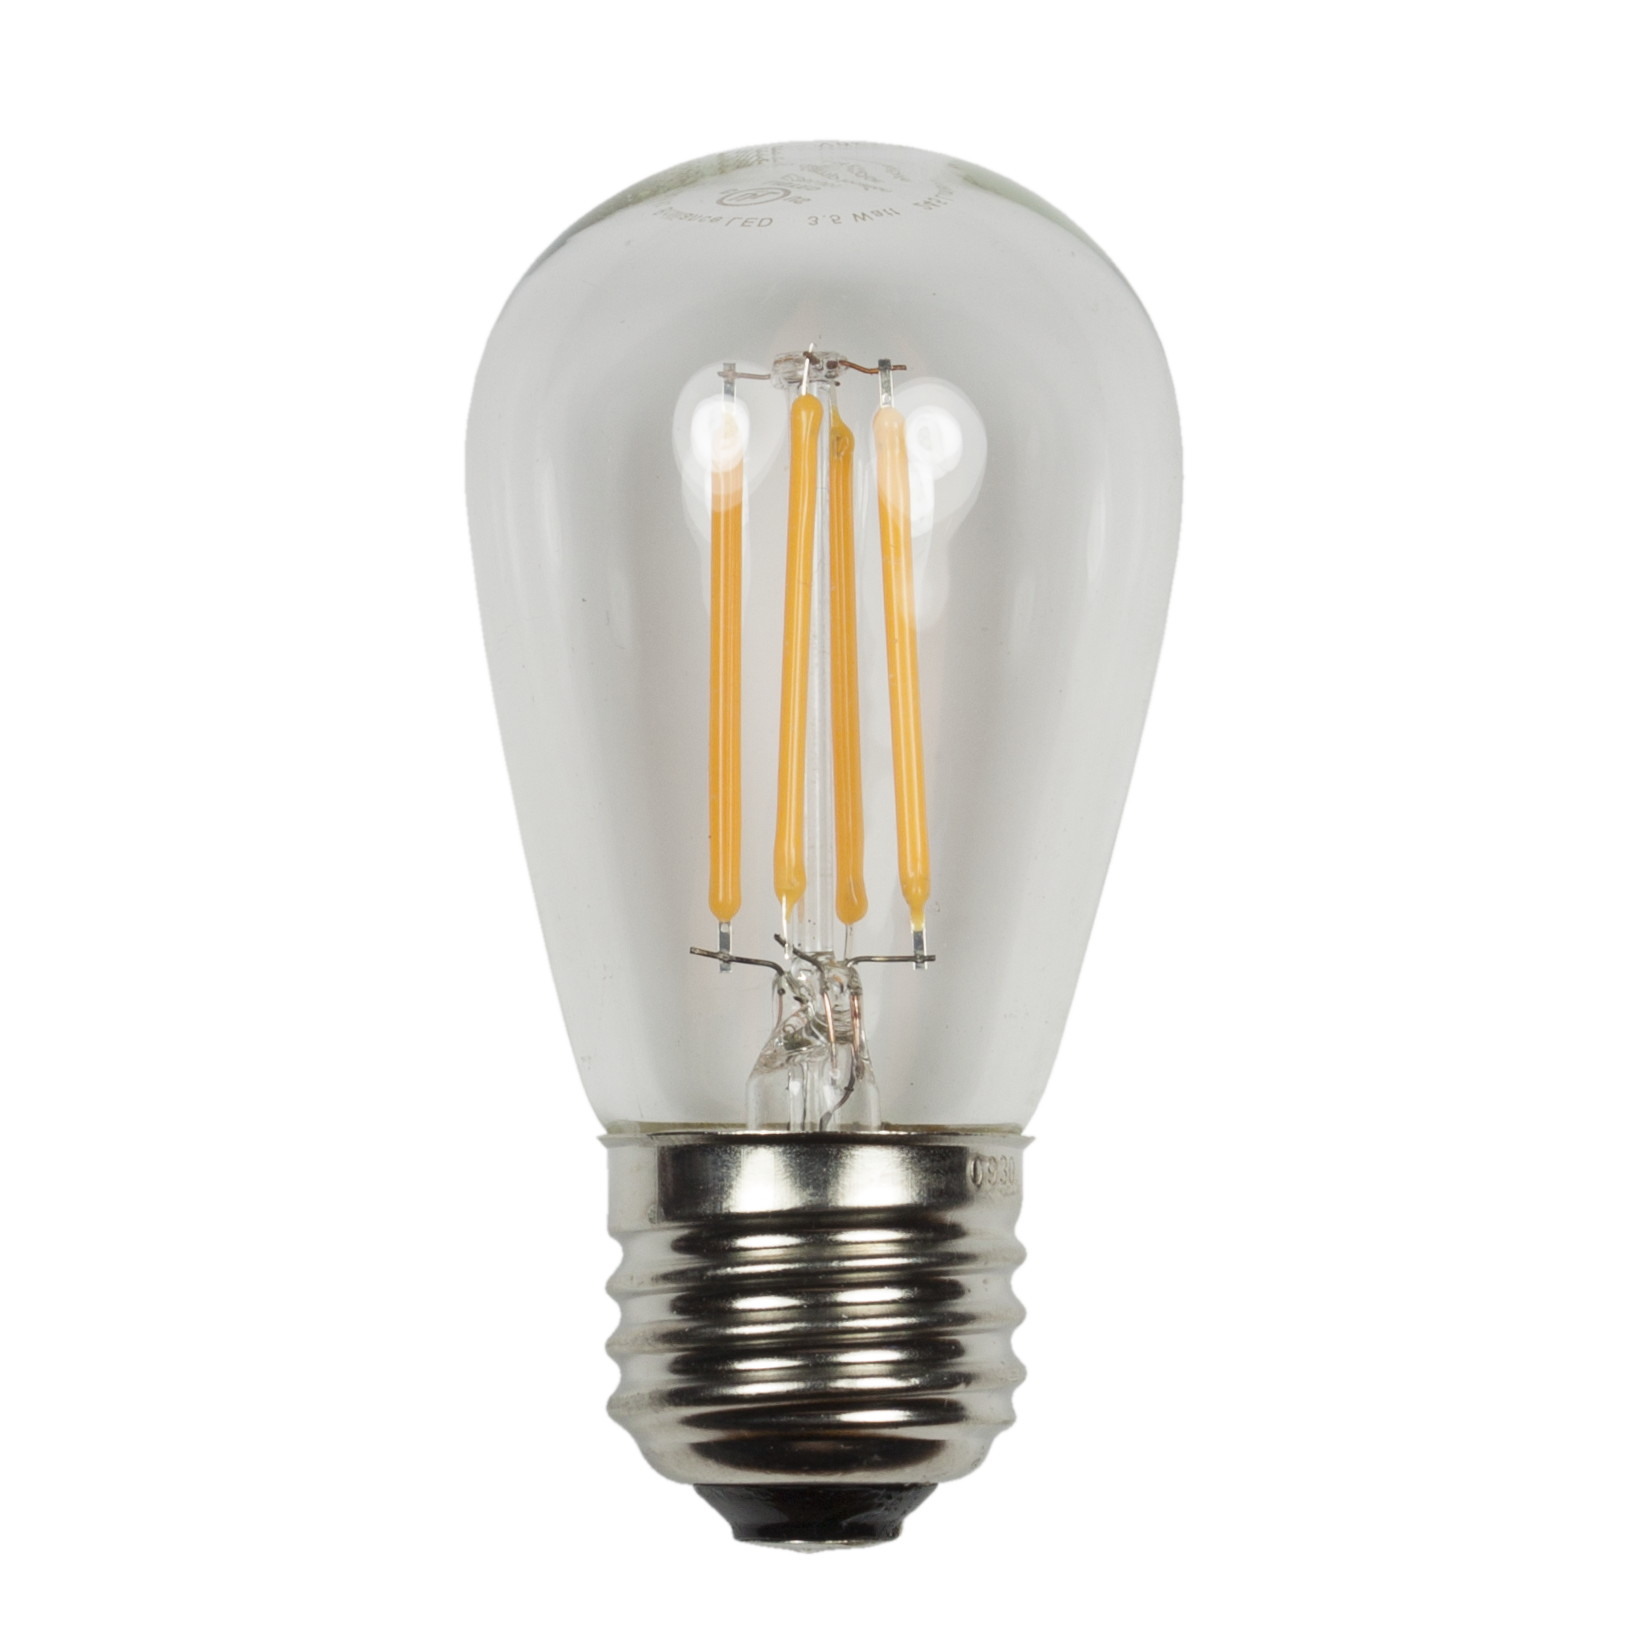 S14 EDGE Filament  Wattage: 3.5 Lumens: 245